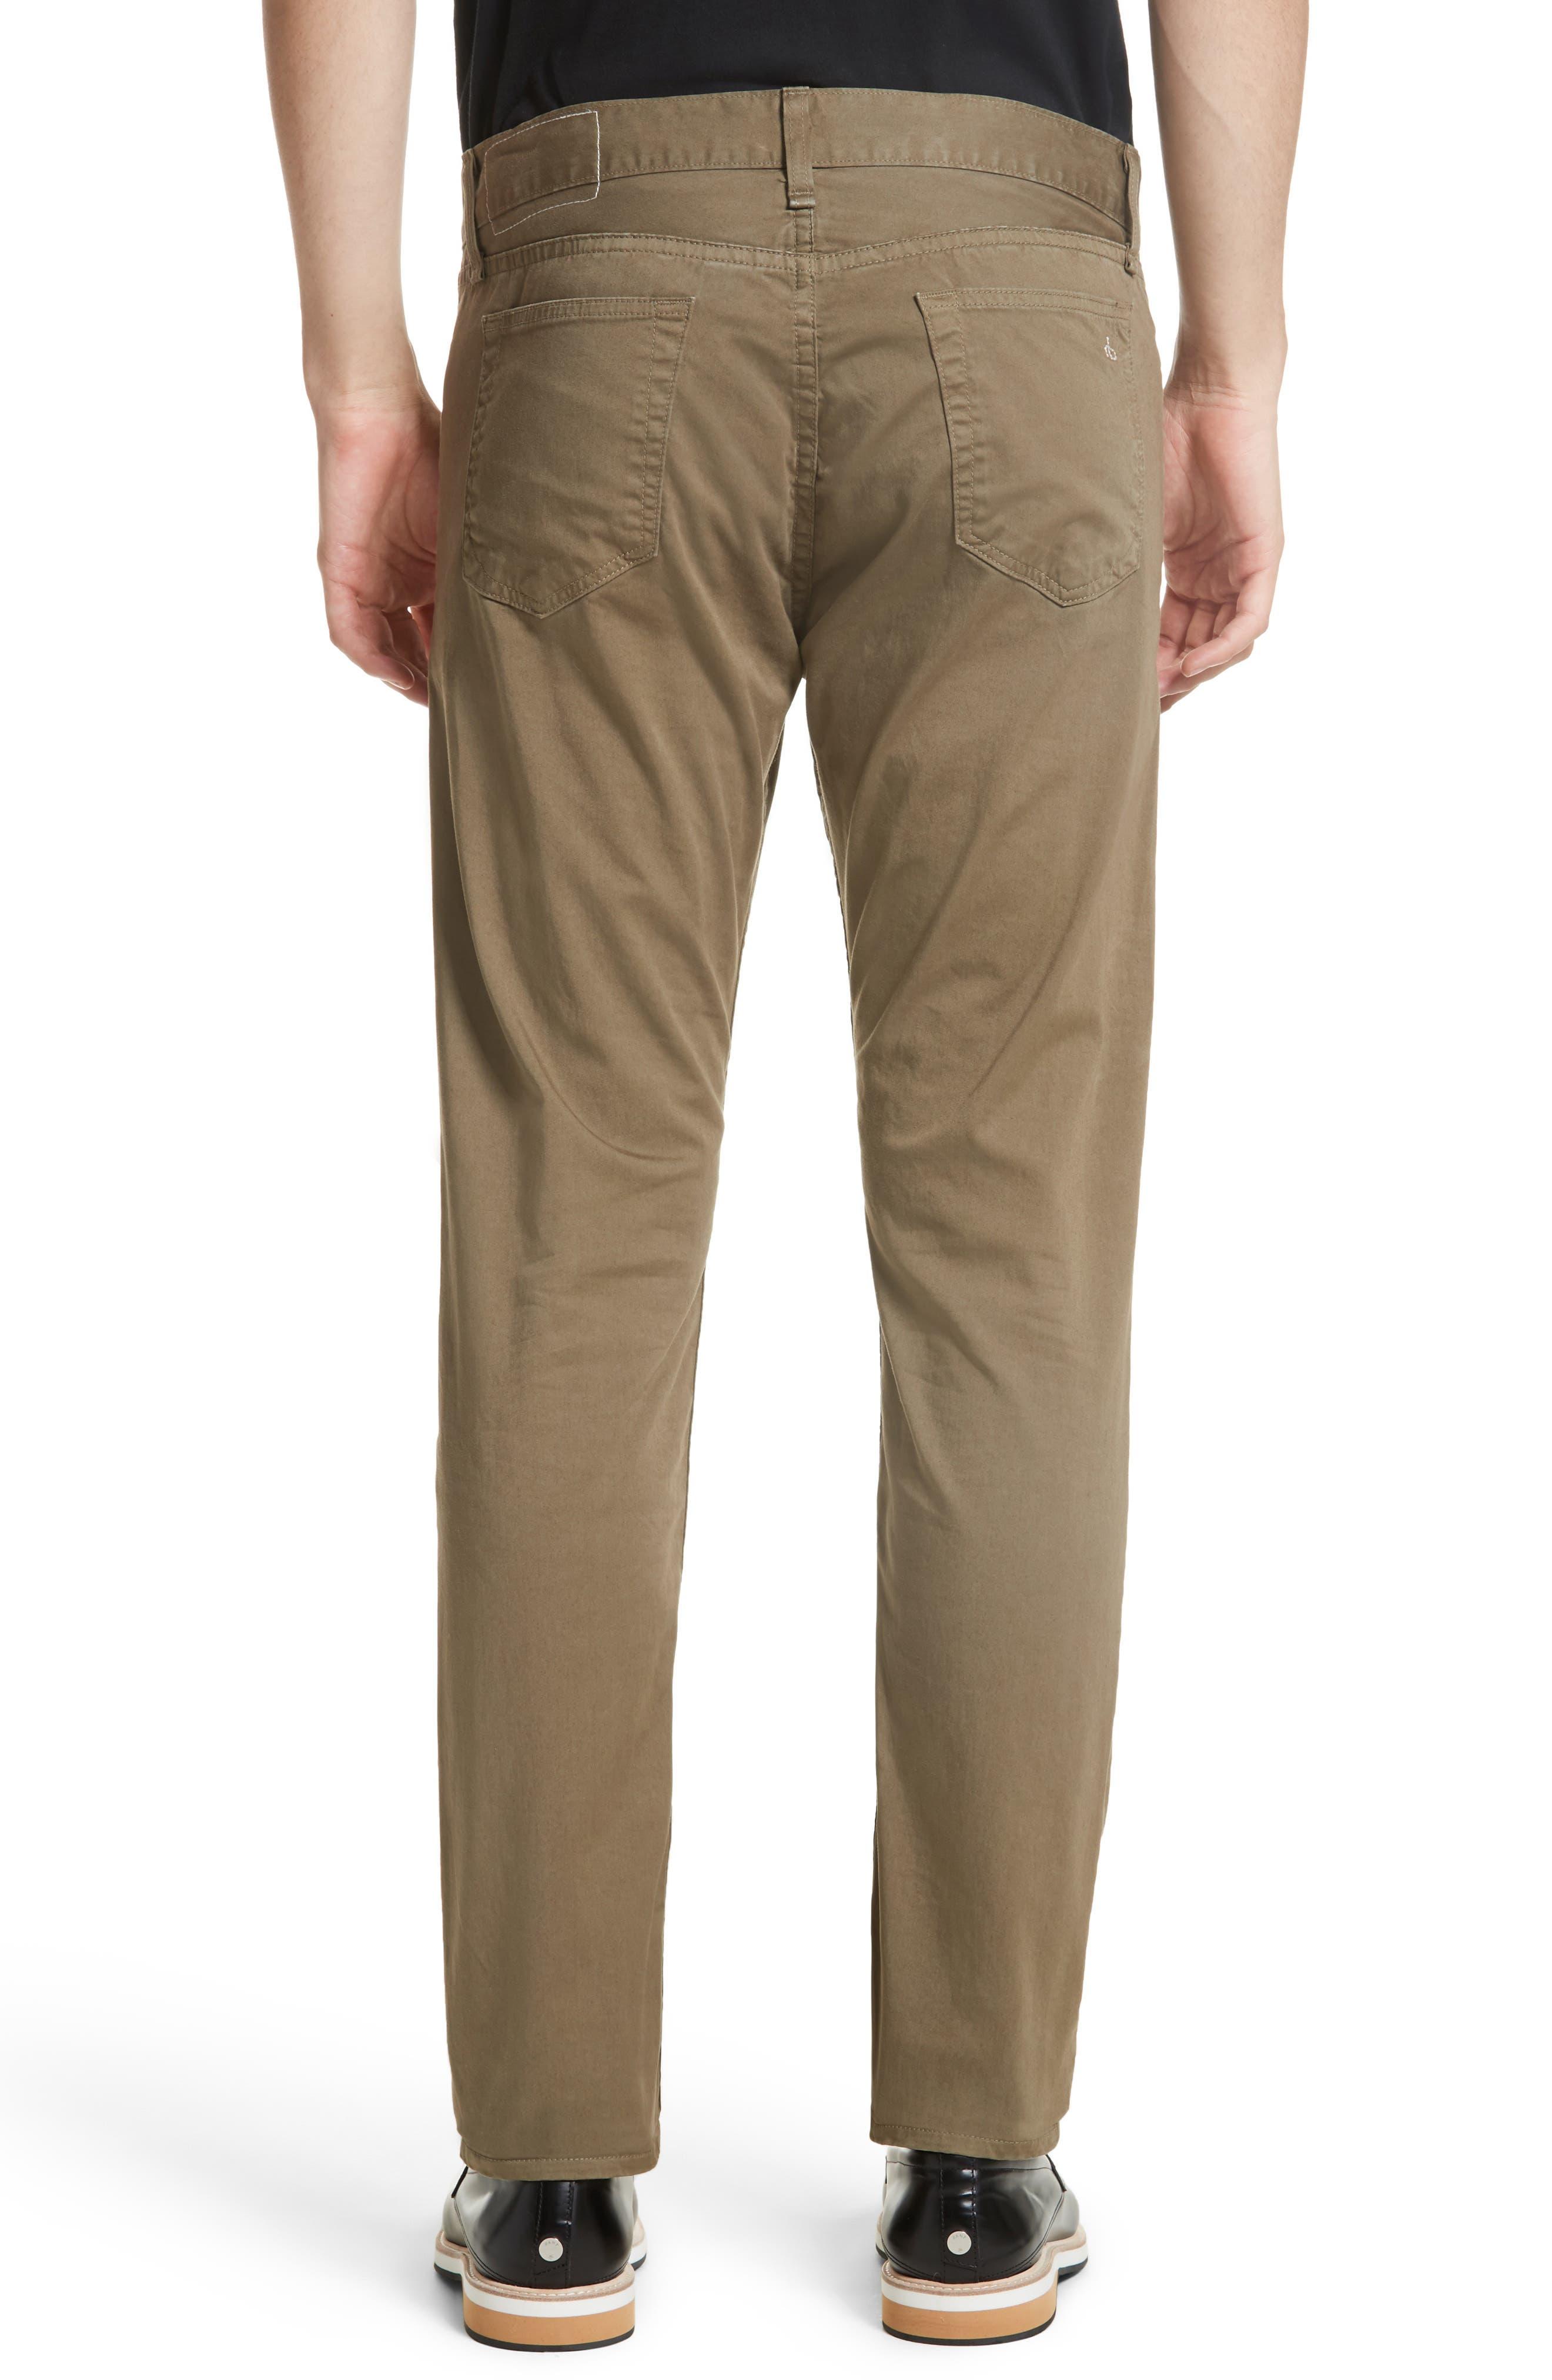 Fit 2 Five-Pocket Twill Pants,                             Alternate thumbnail 2, color,                             319